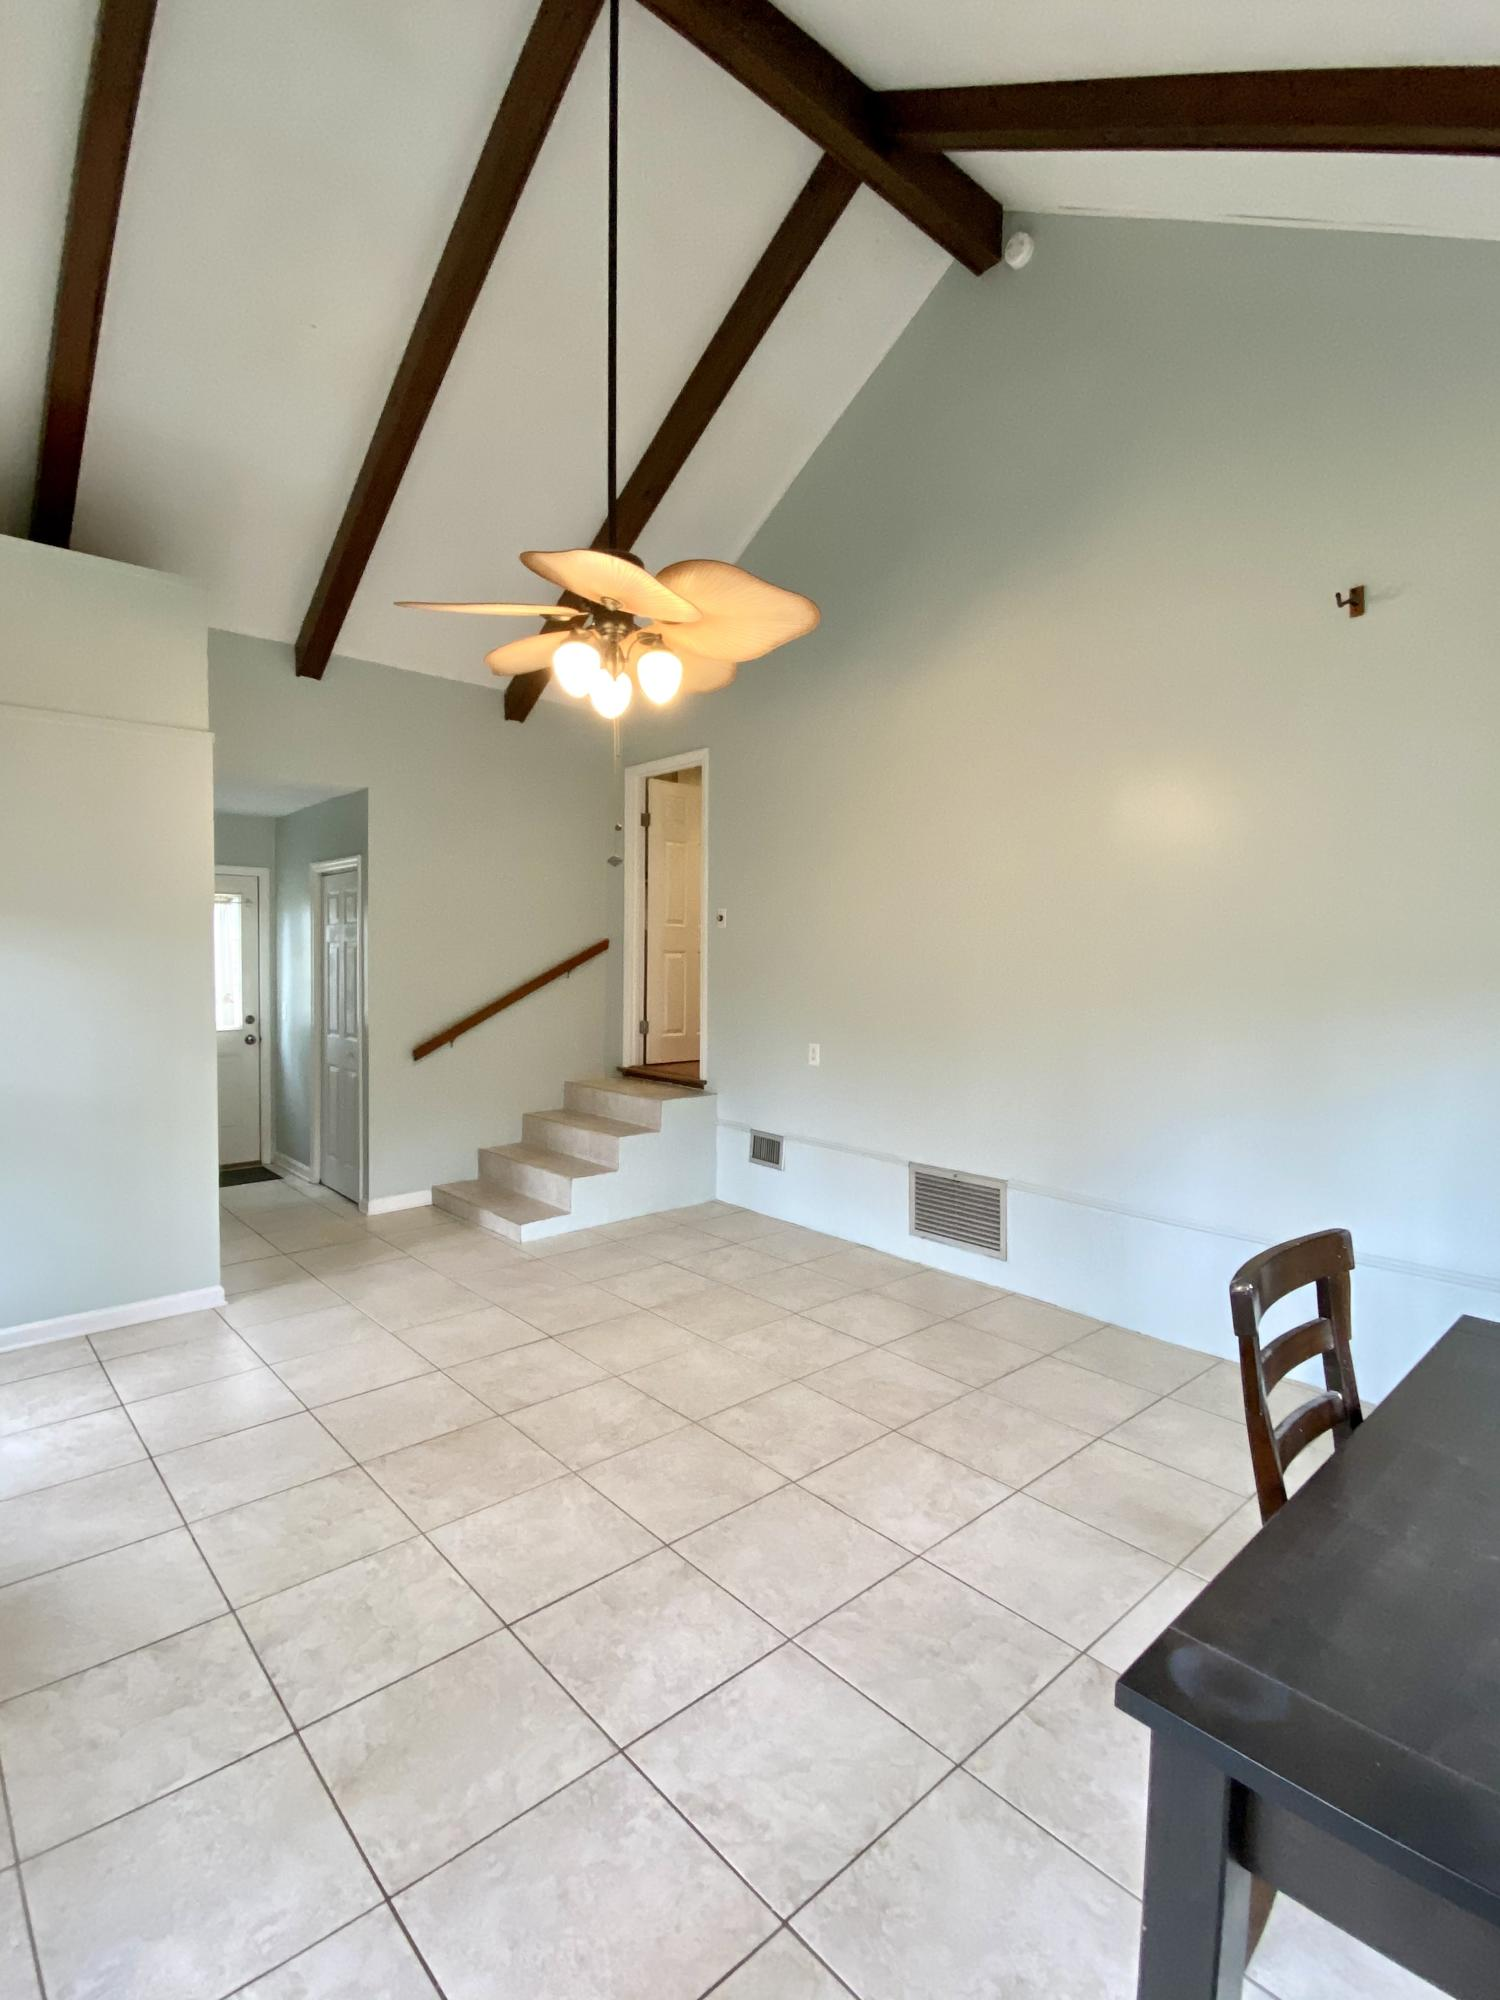 Palmetto Fort Homes For Sale - 1510 Lakeshore, Mount Pleasant, SC - 21